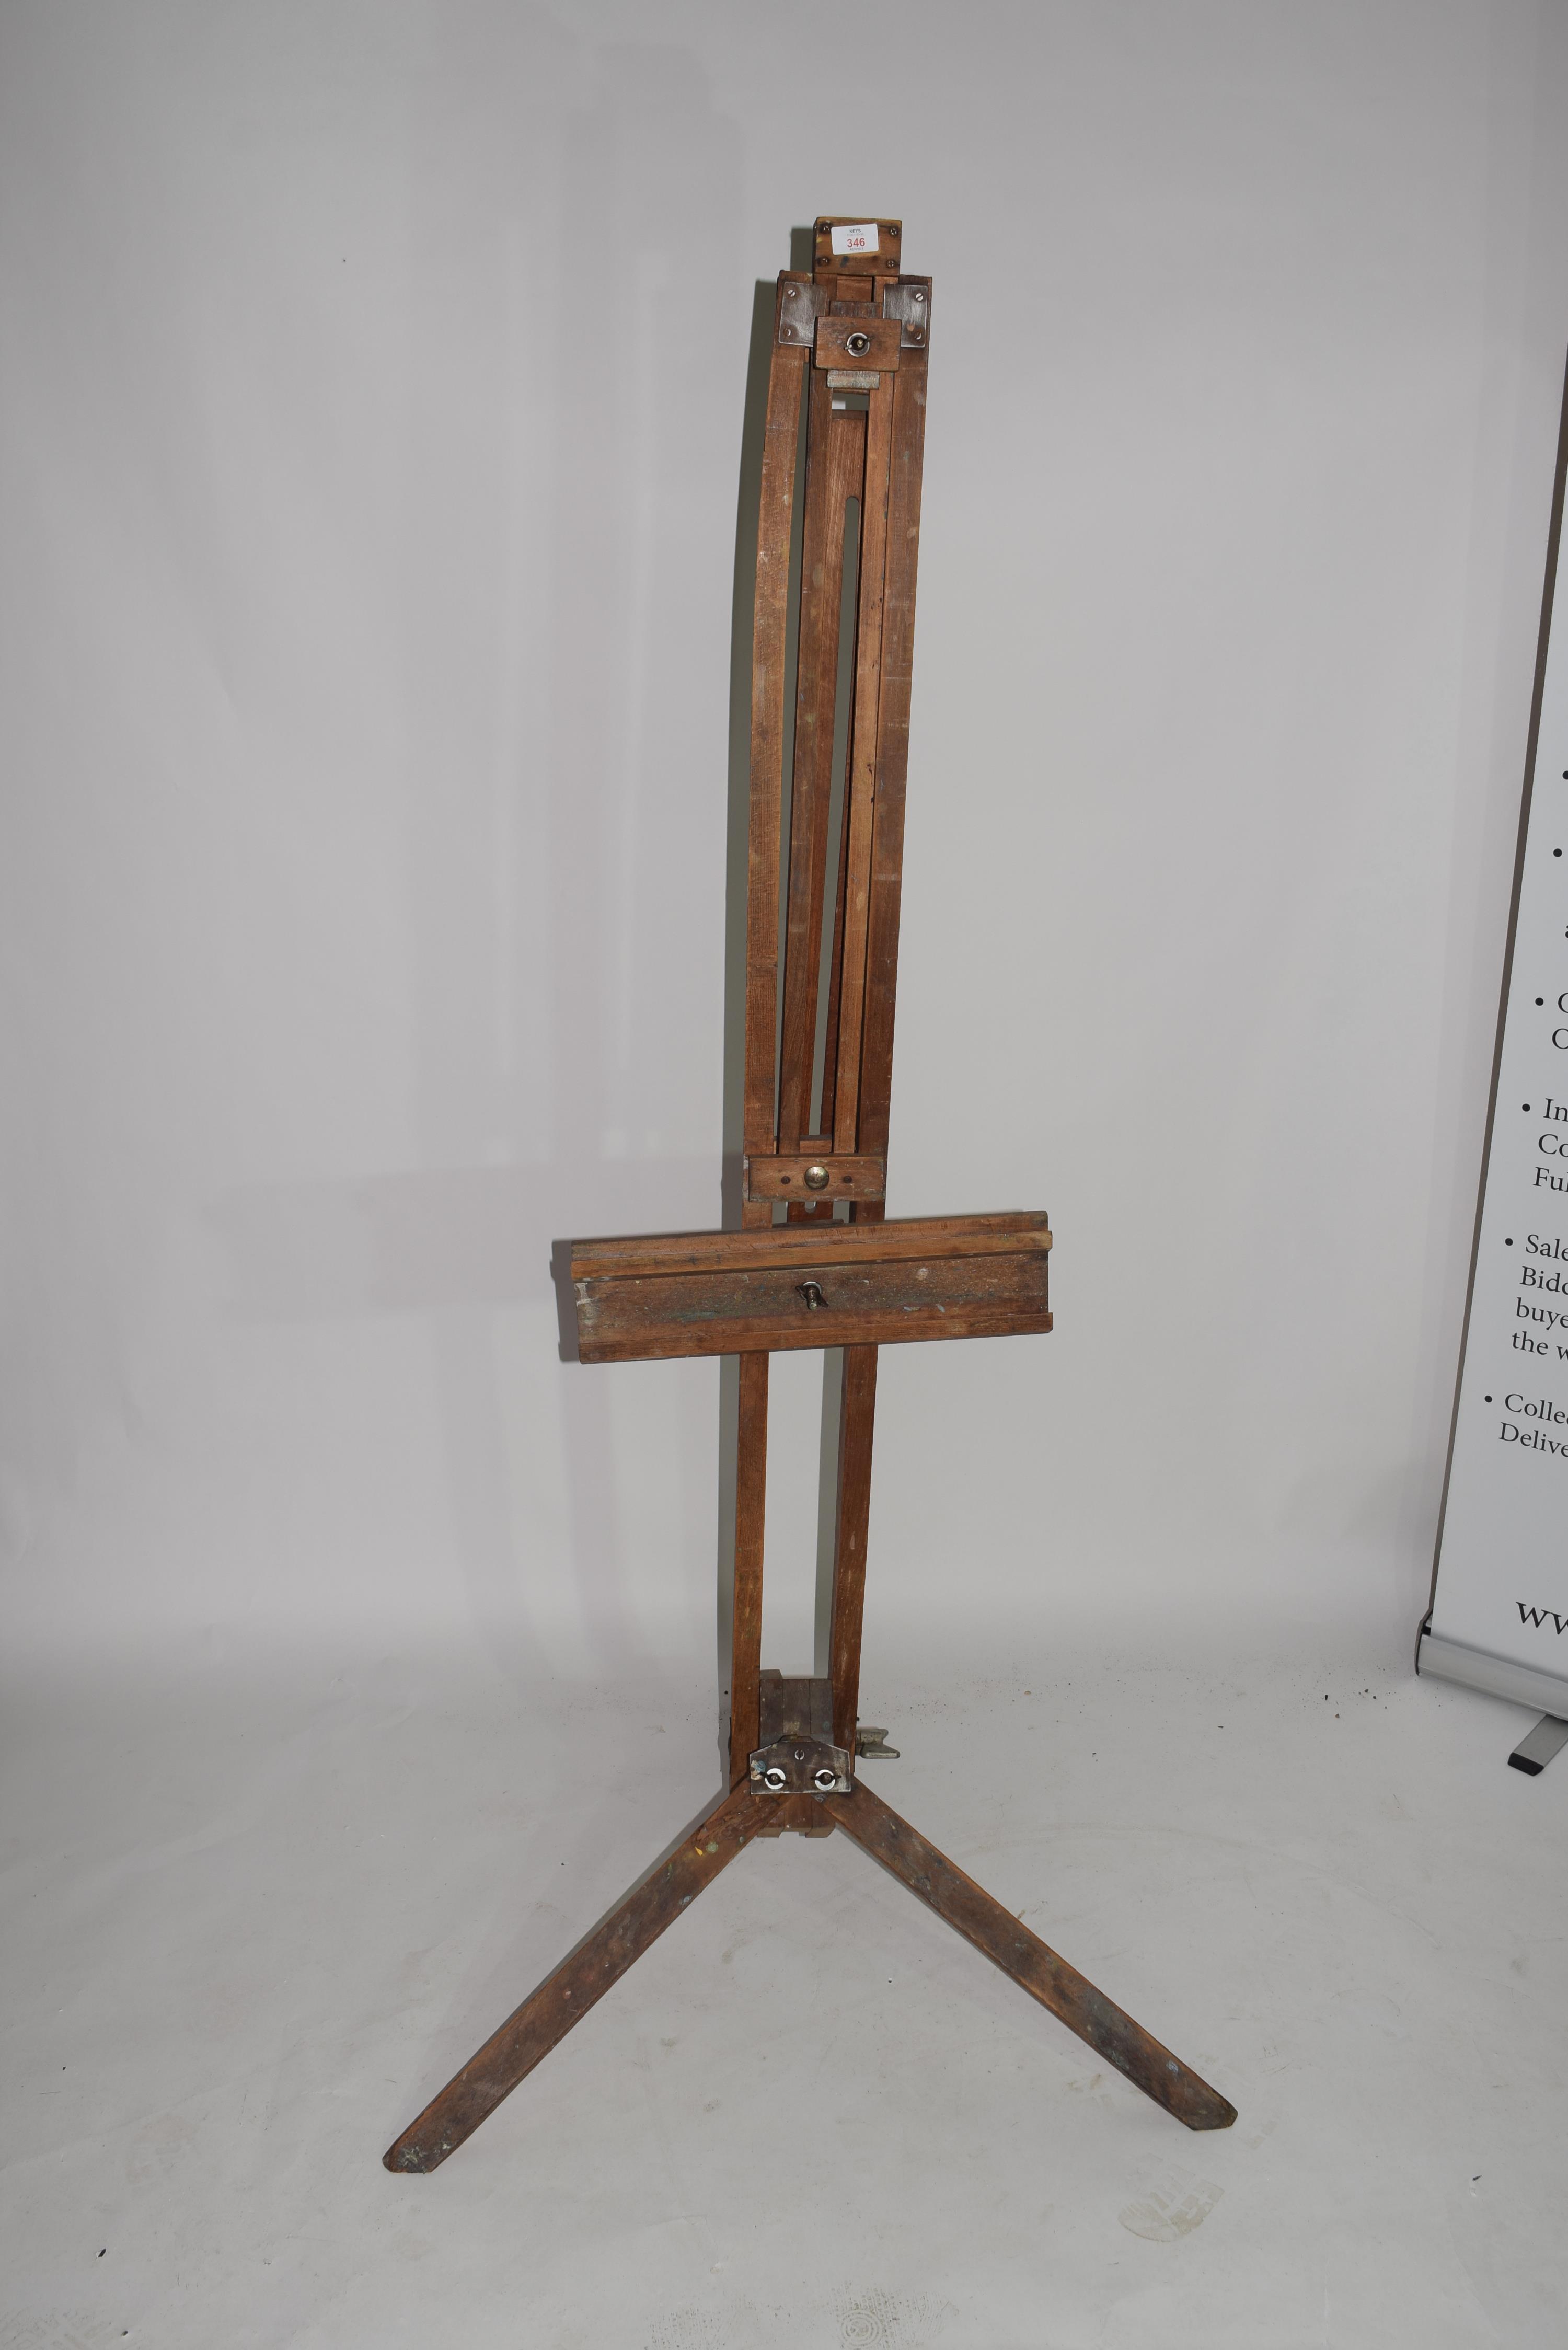 Folding wooden artists easel